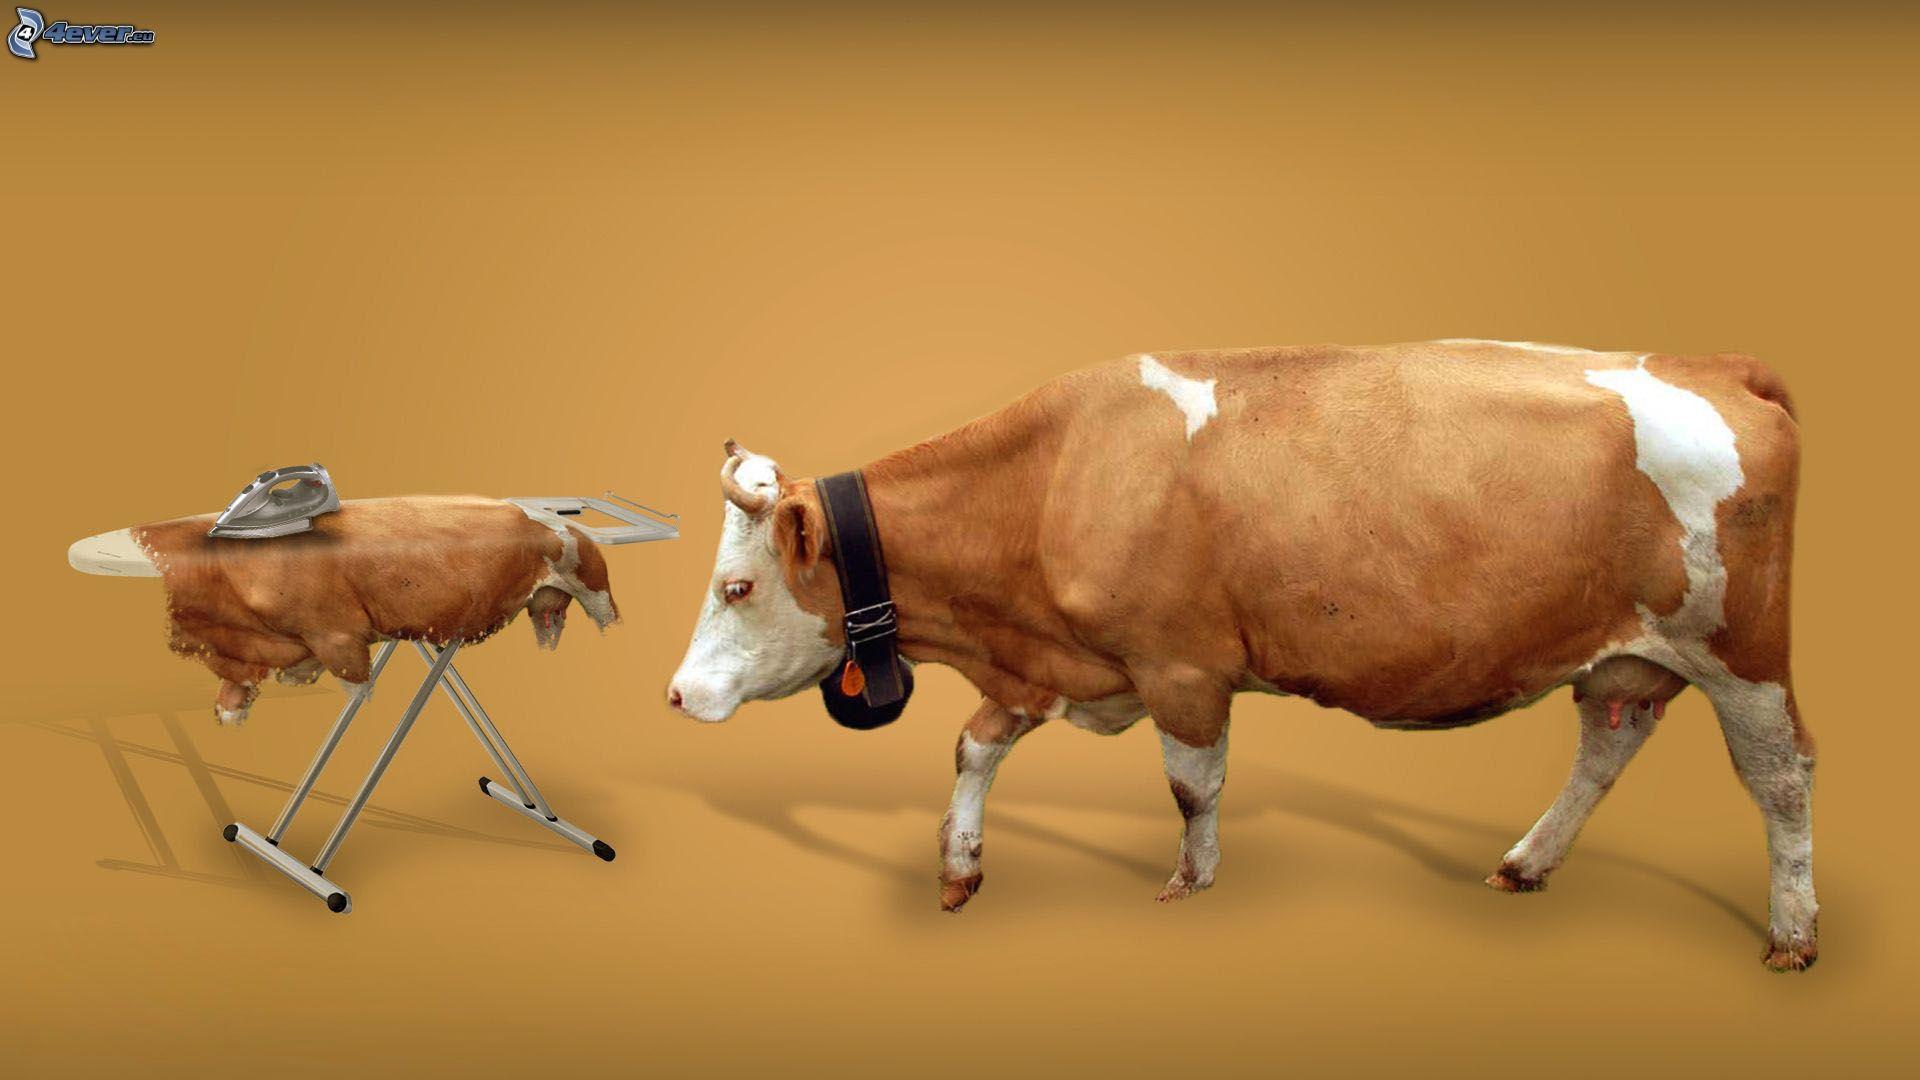 da bò nhập khẩu italia